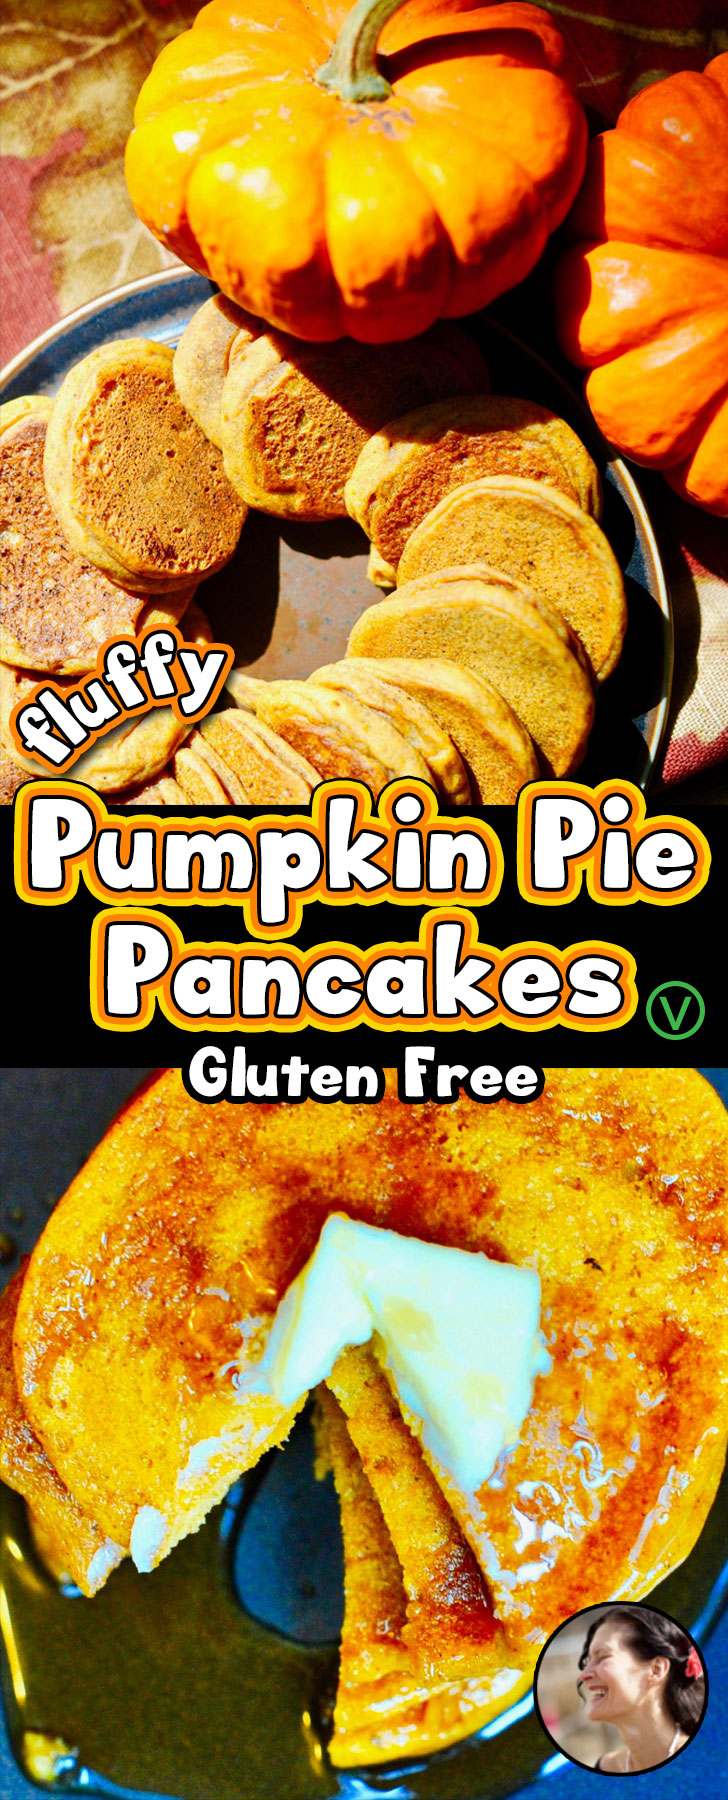 Fluffy Gluten Free Vegan Pumpkin Pie Pancakes! So fluffy they levitate! #aquafaba, Easy 20 minute